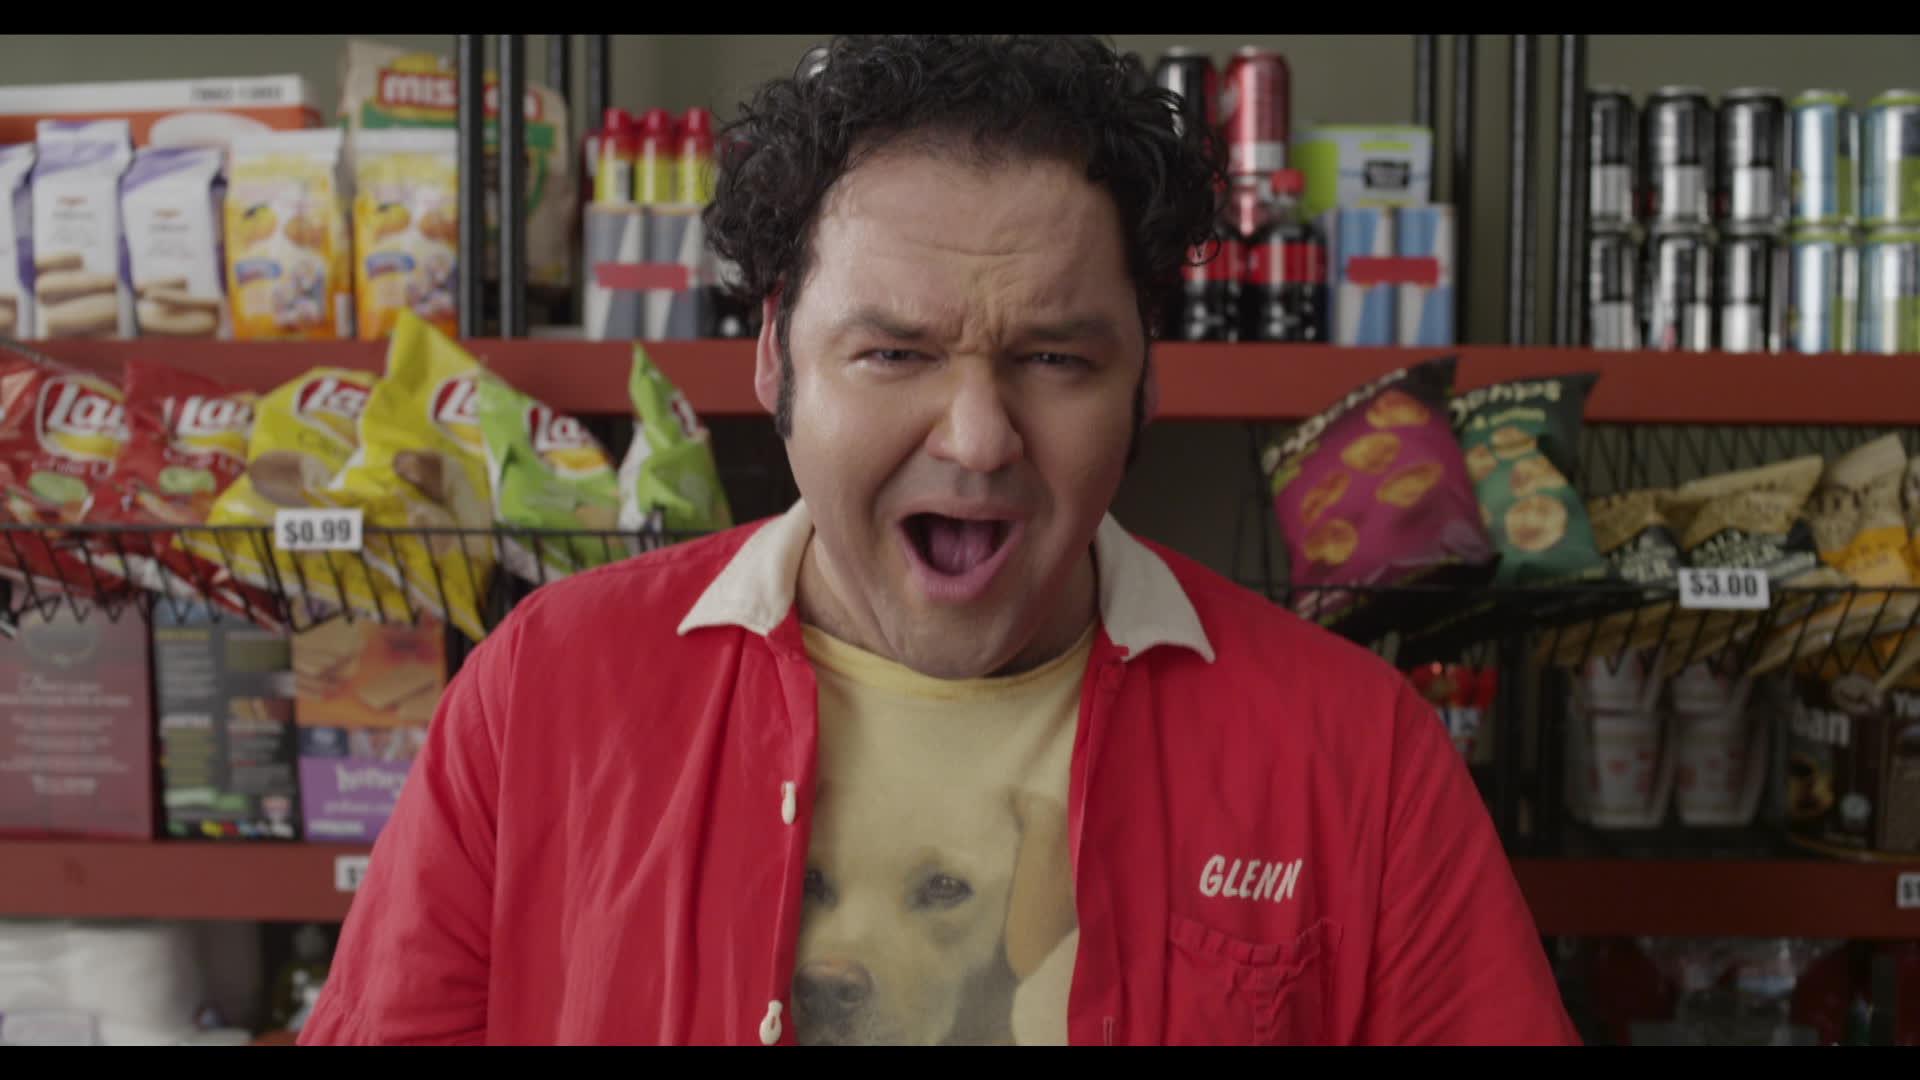 Official Viki Channel Episode 12: Viki Convenience Store Commercial